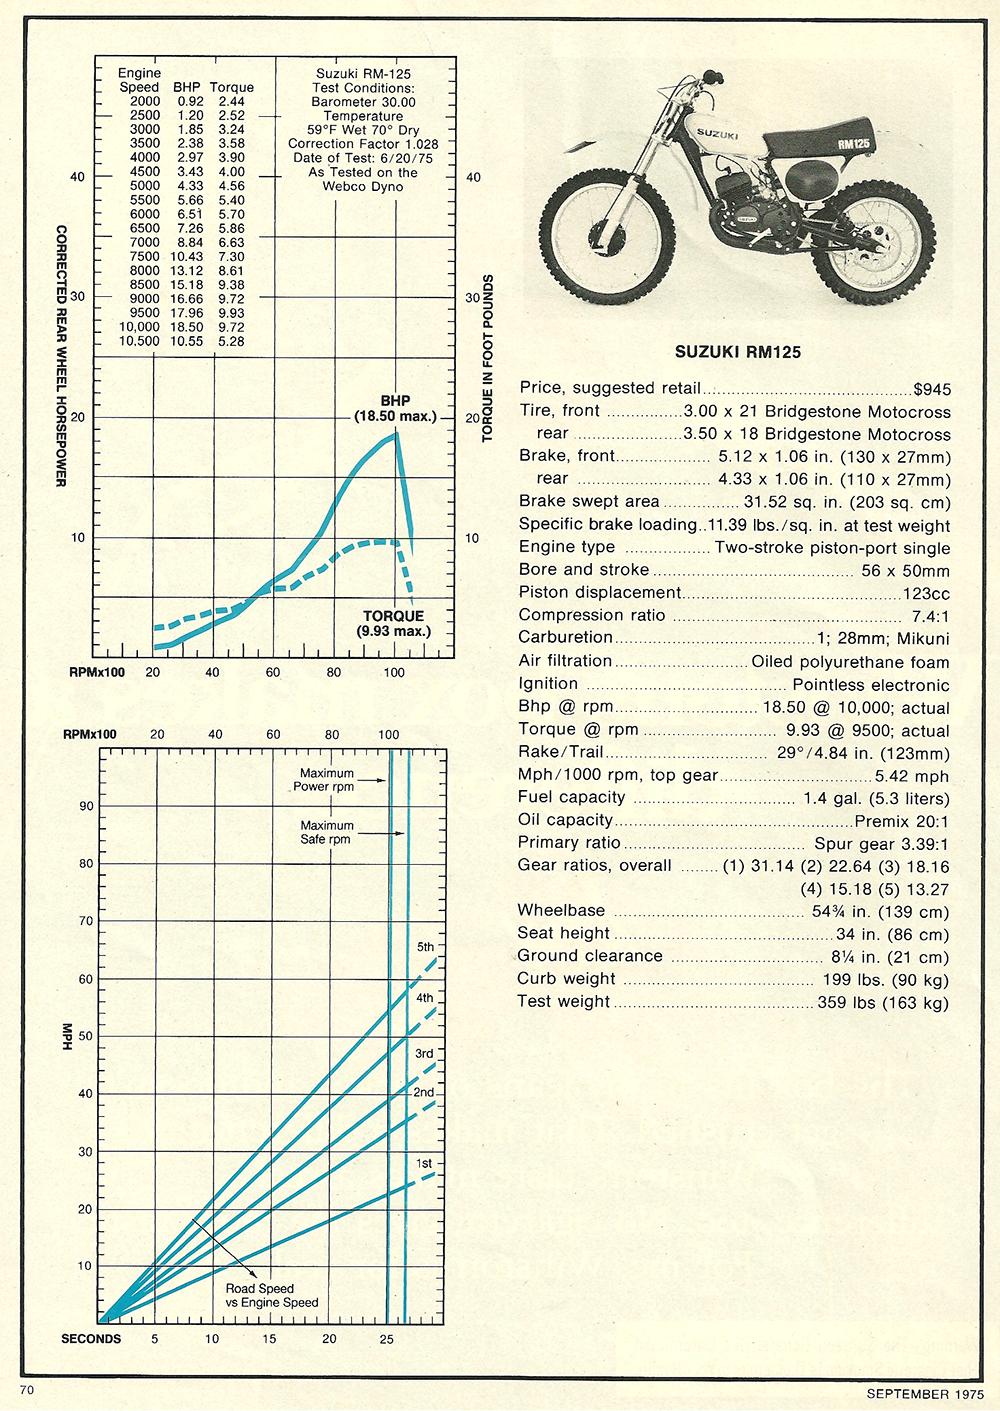 1975 Suzuki RM 125 road test 4.png